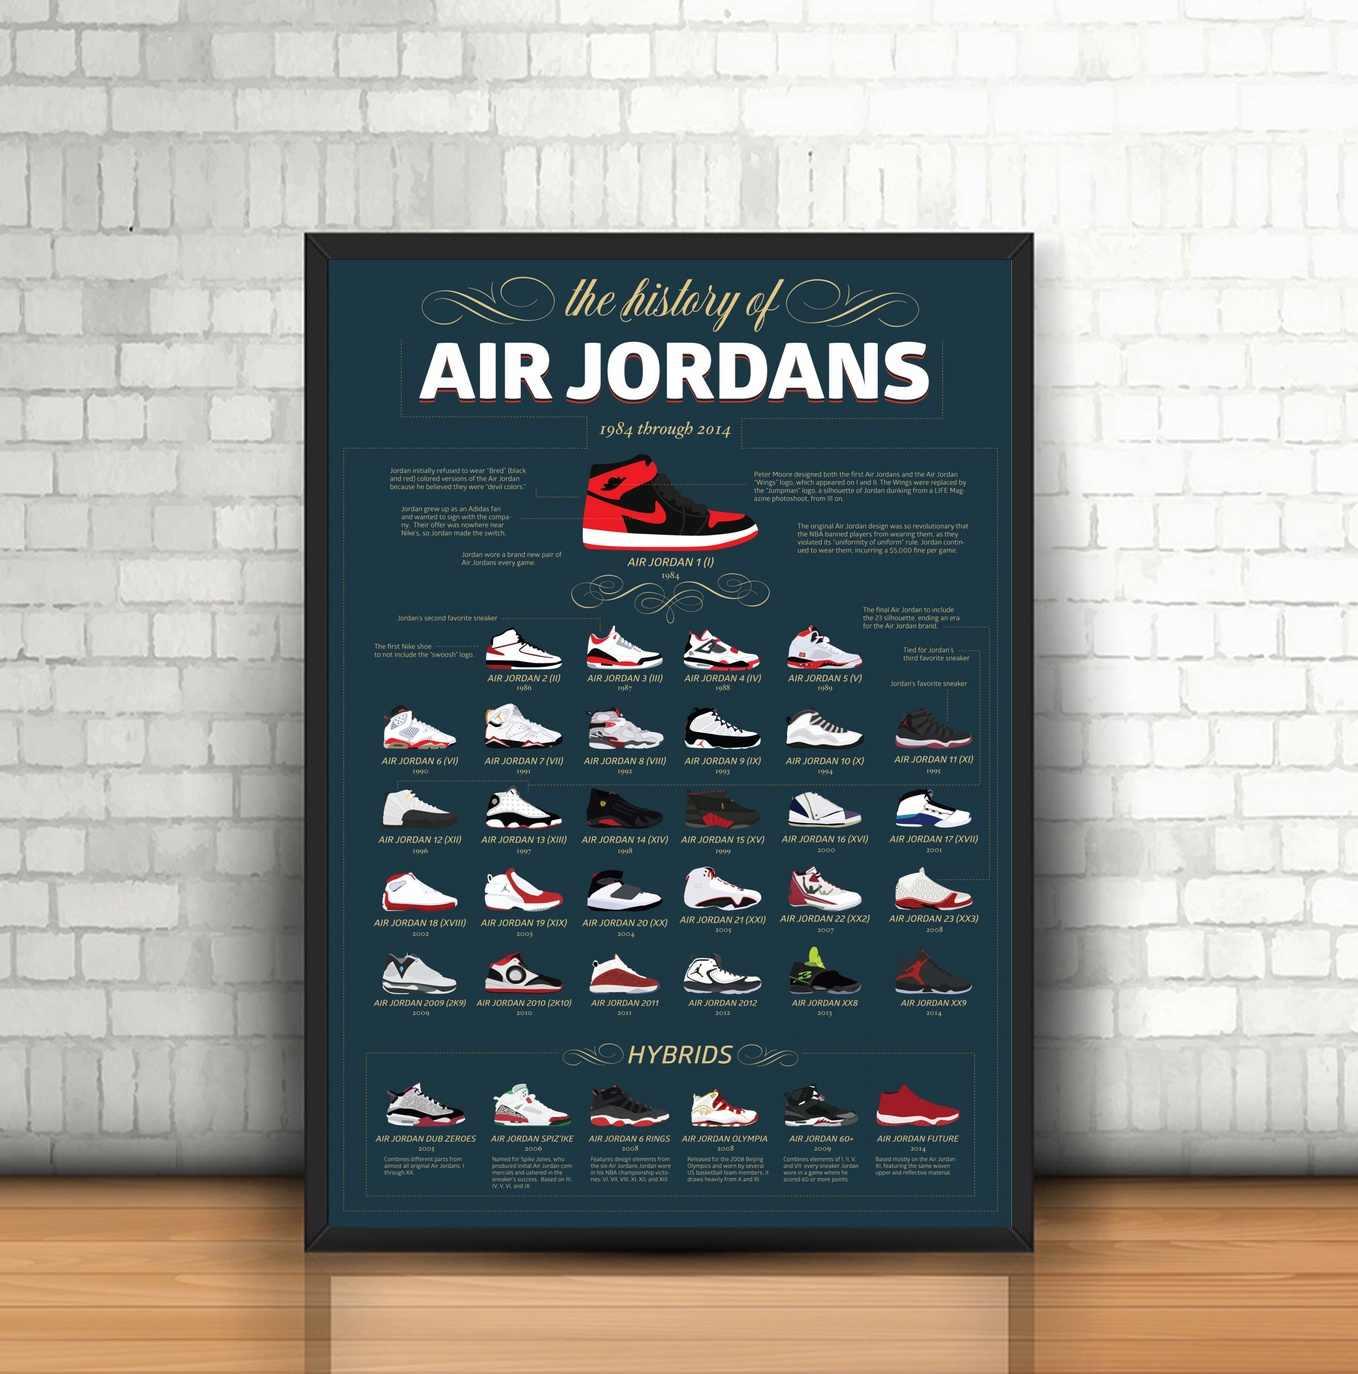 432b22b641eb Detail Feedback Questions about Michael Jordan Shoes MJ 23 History Sneaker  Shoes Nice Art Poster Silk Print Home Decor on Aliexpress.com